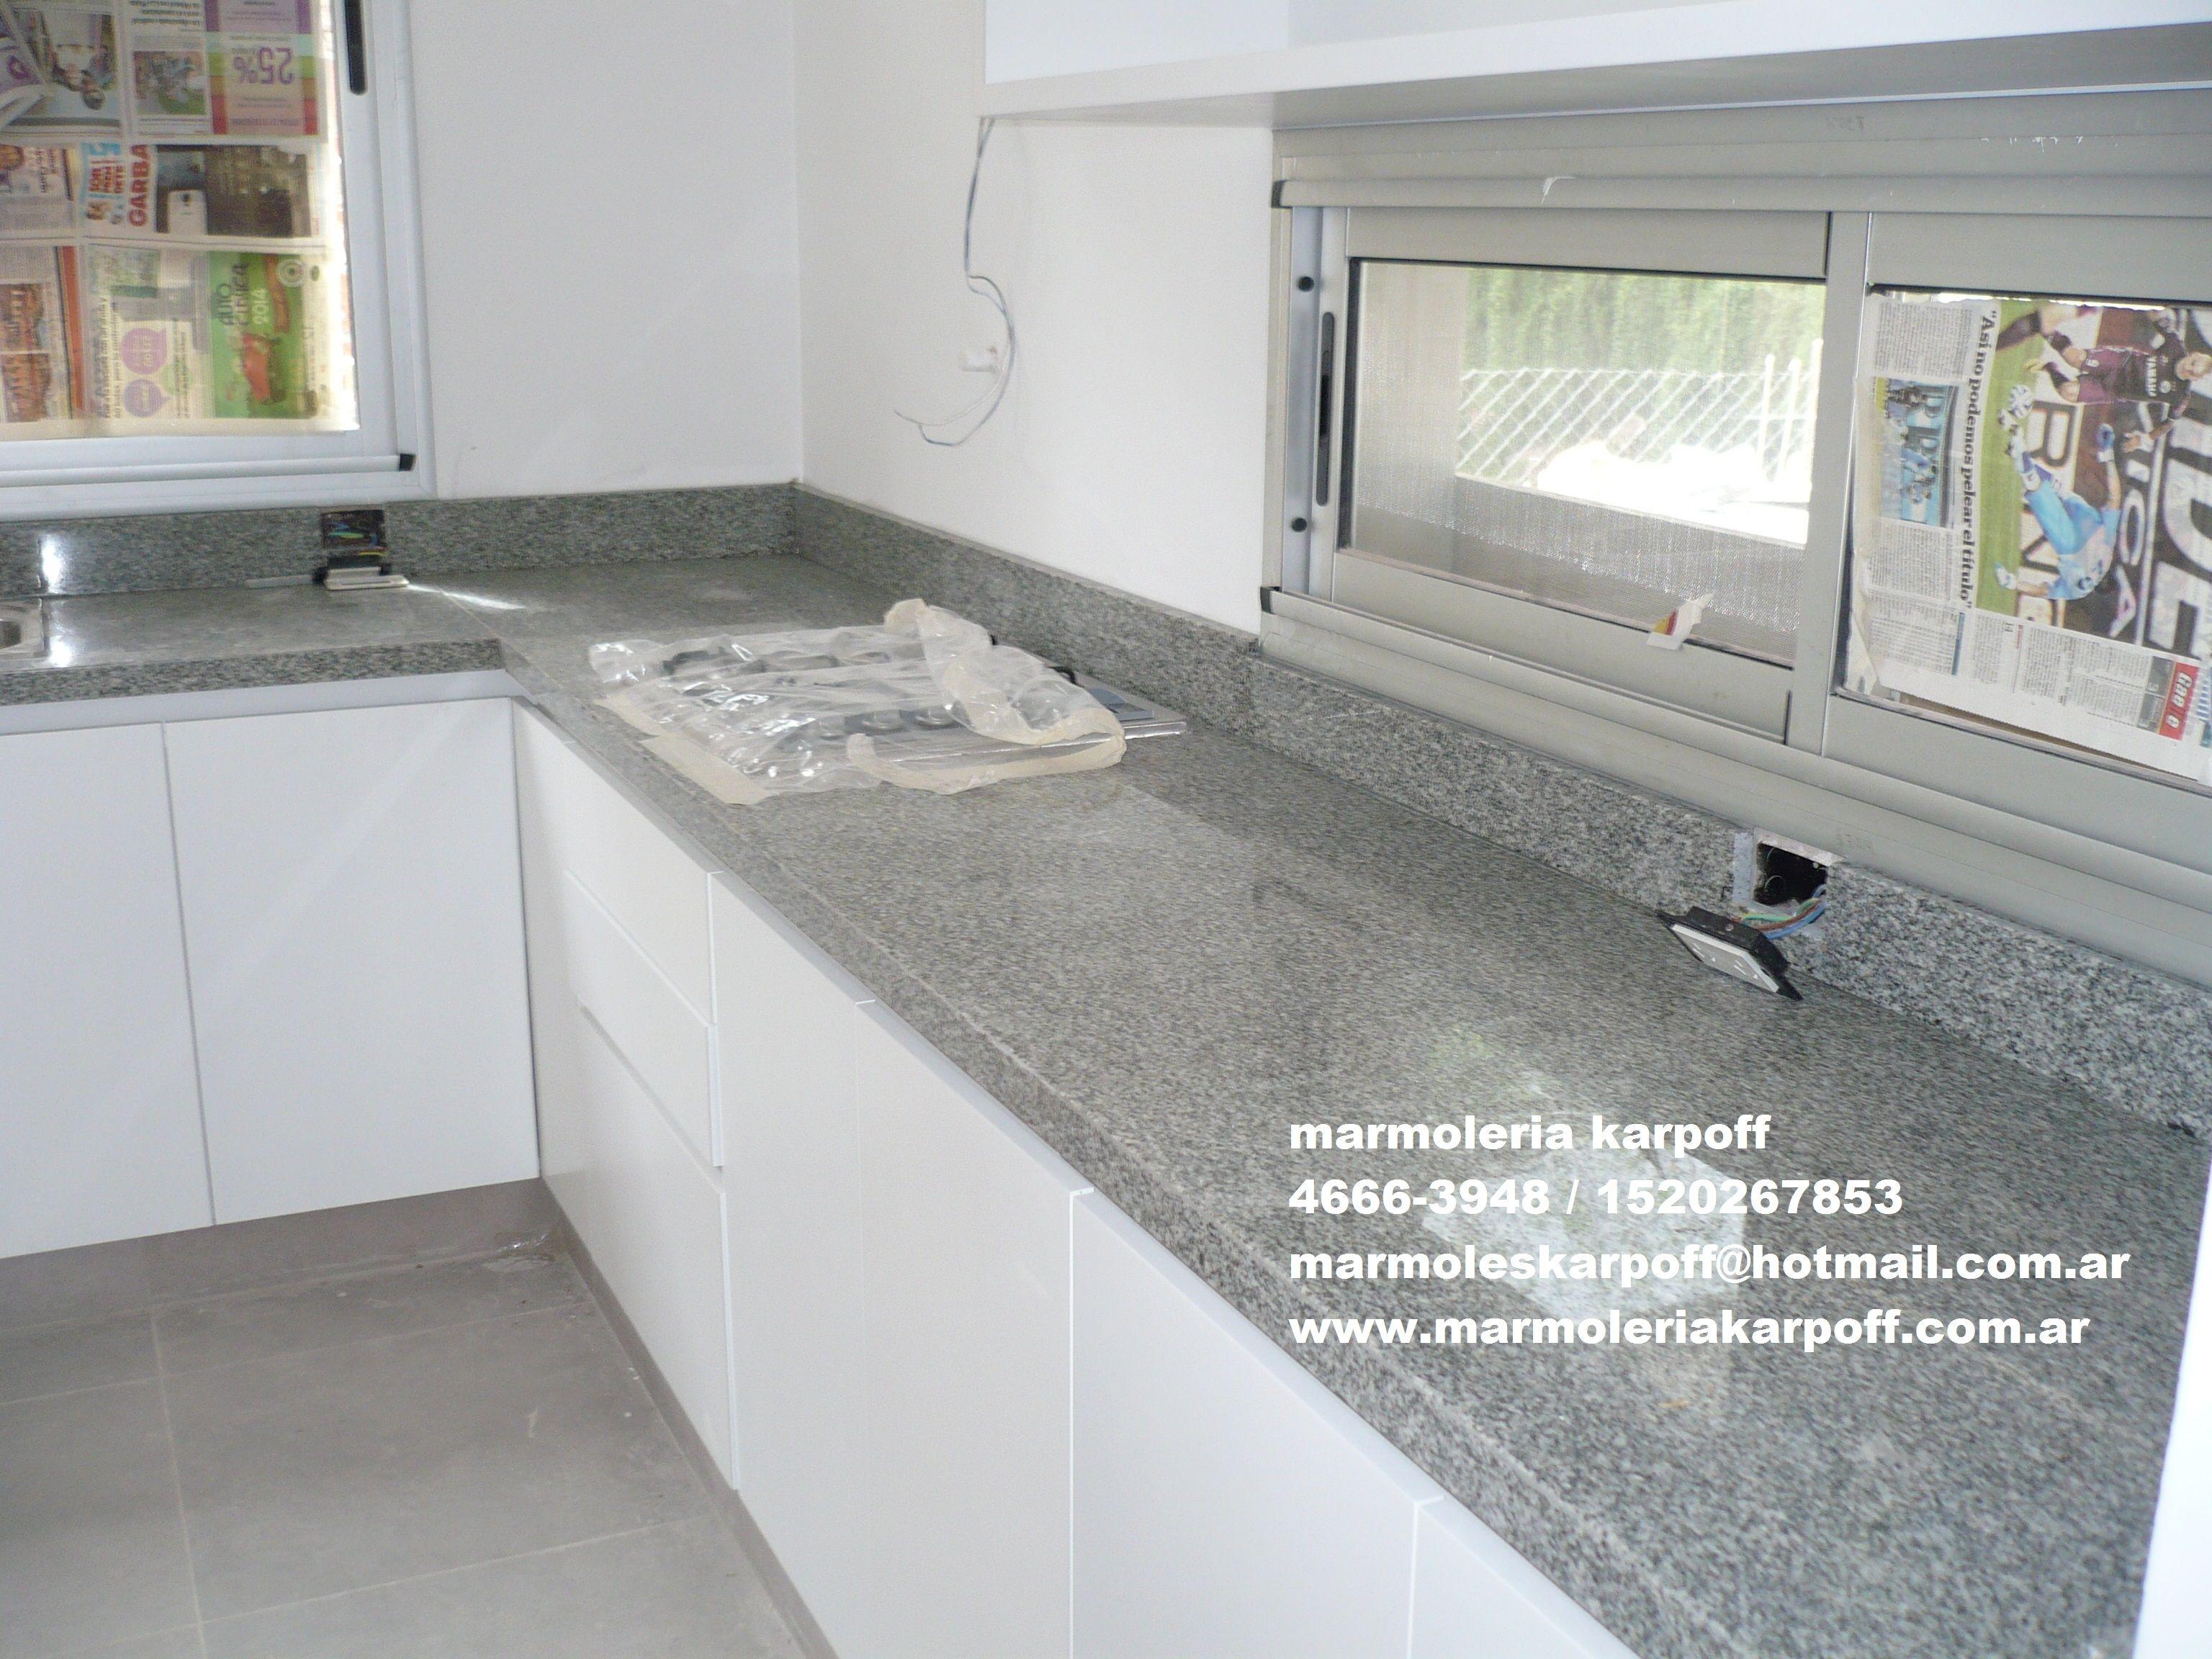 Mesada en granito gris mara marmoler a karpoff for Encimera cocina marmol o granito